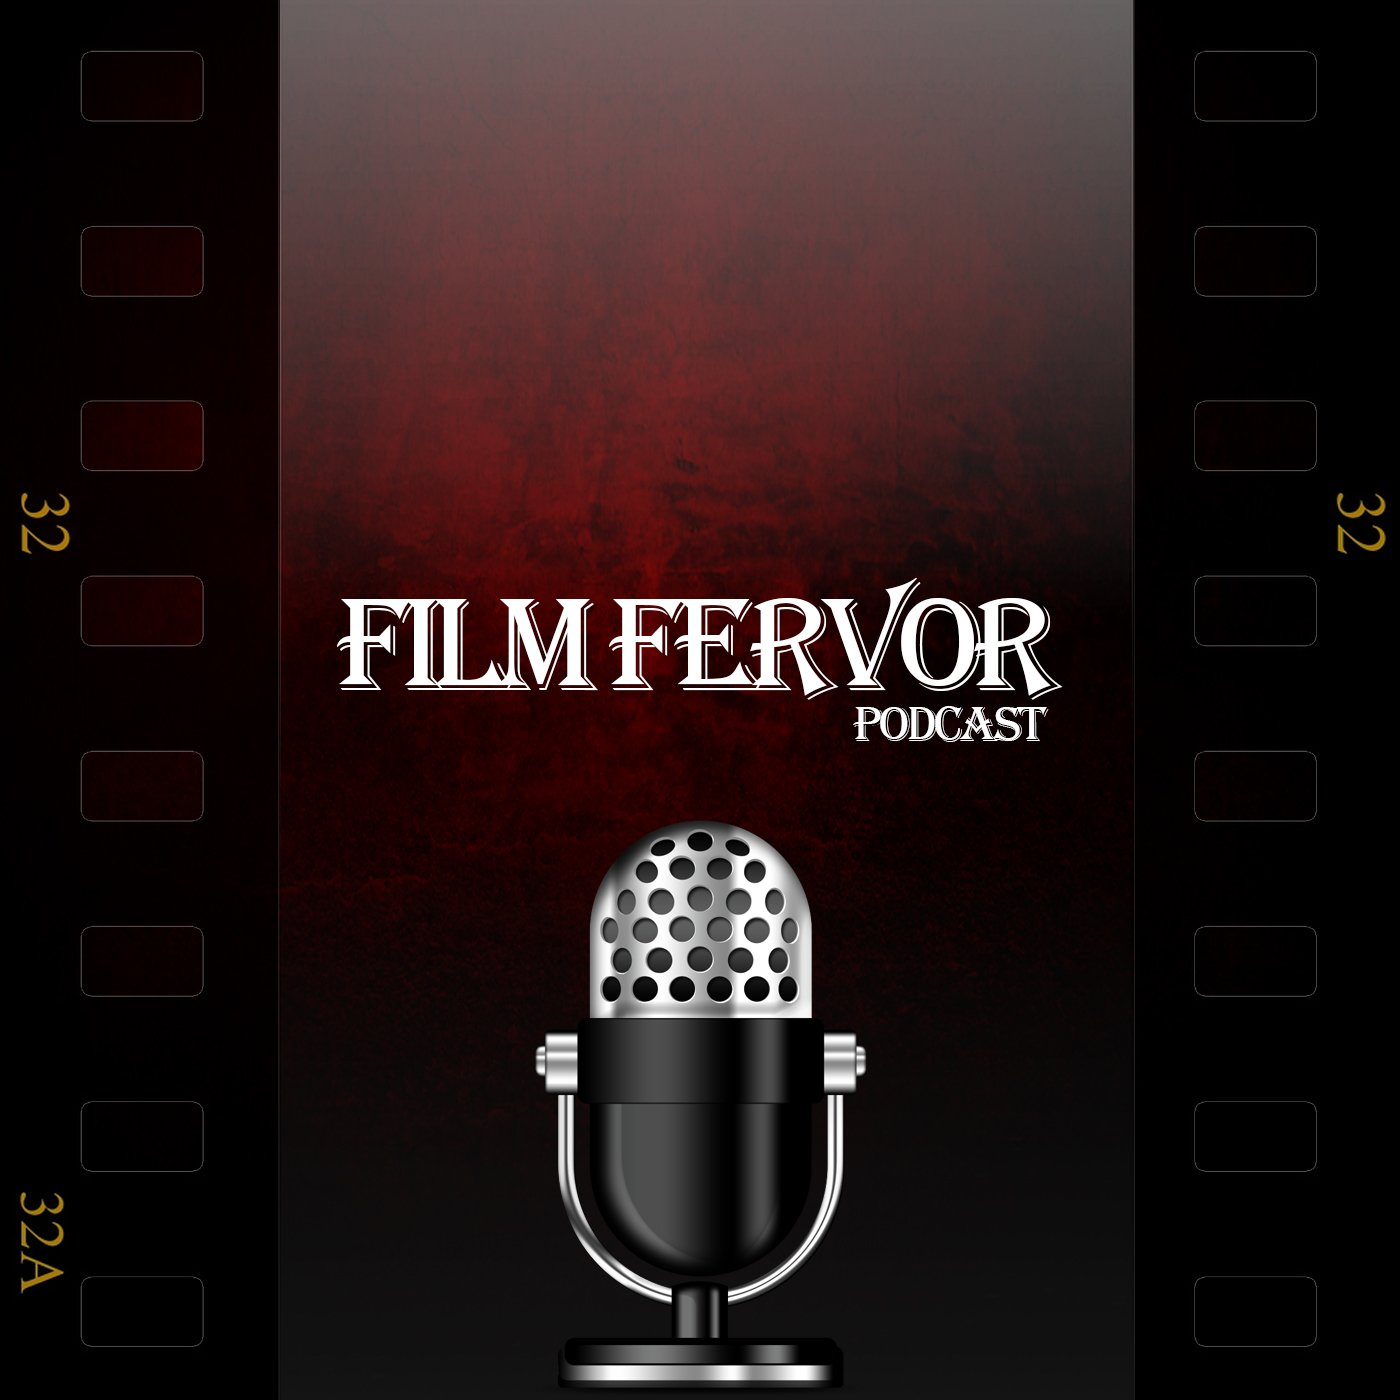 Film Fervor